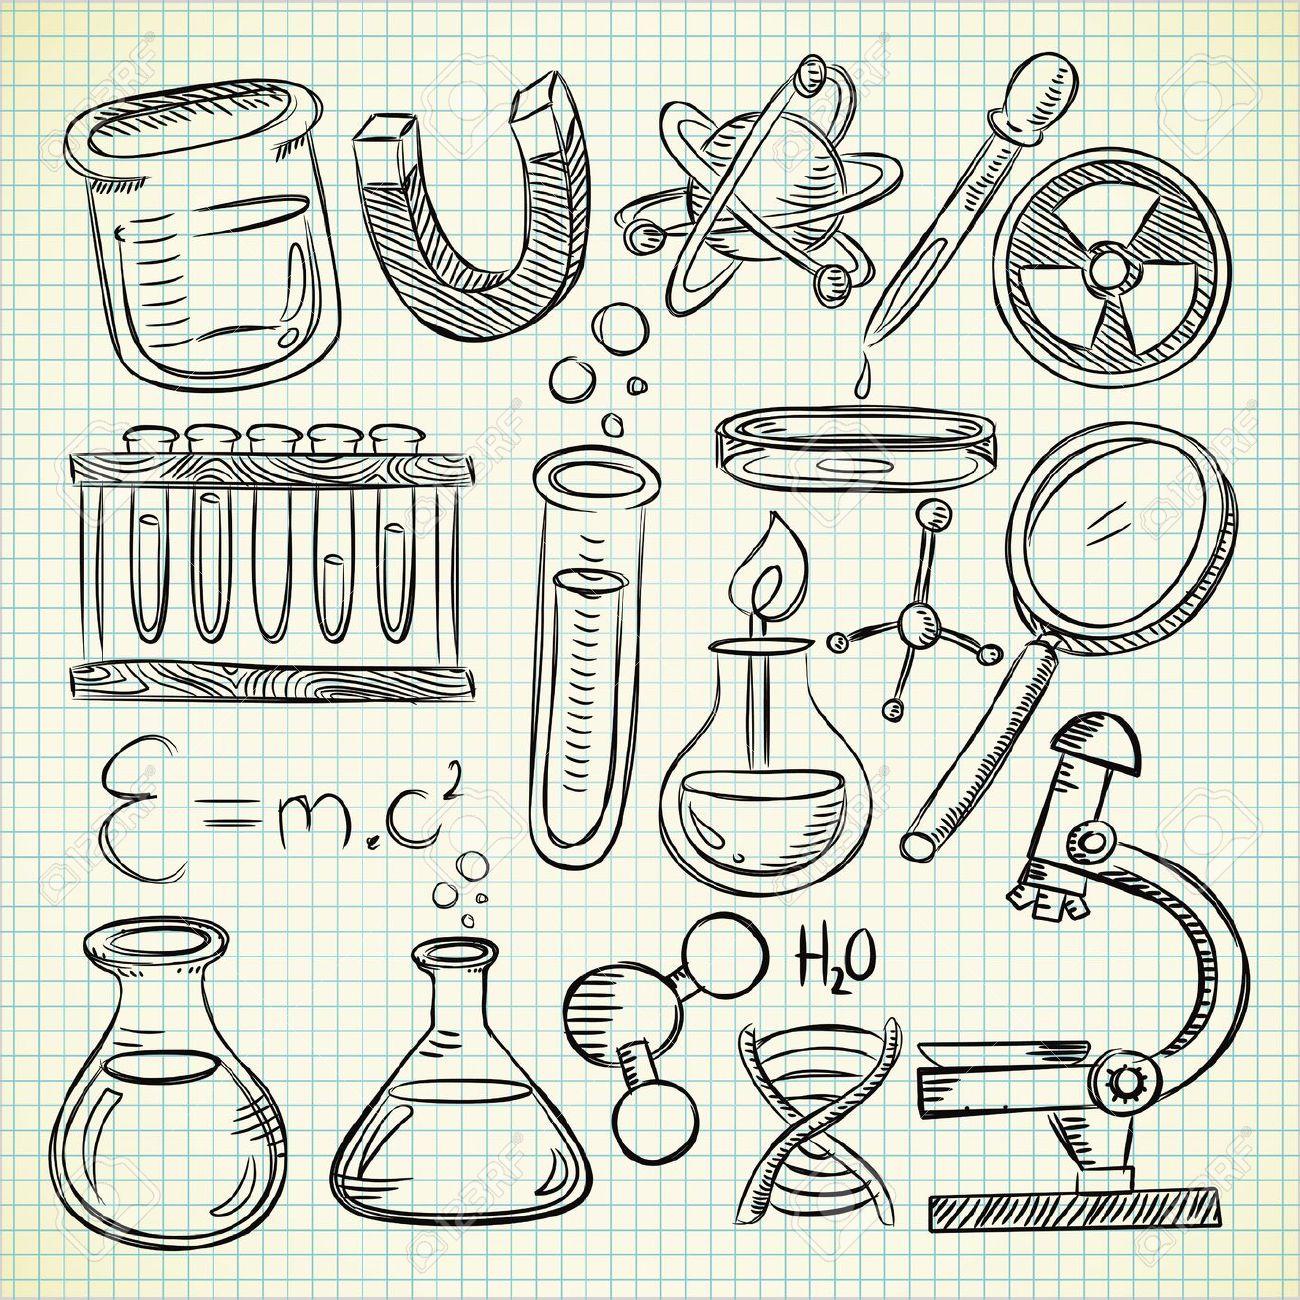 chemistry drawing science stuff doodle getdrawings